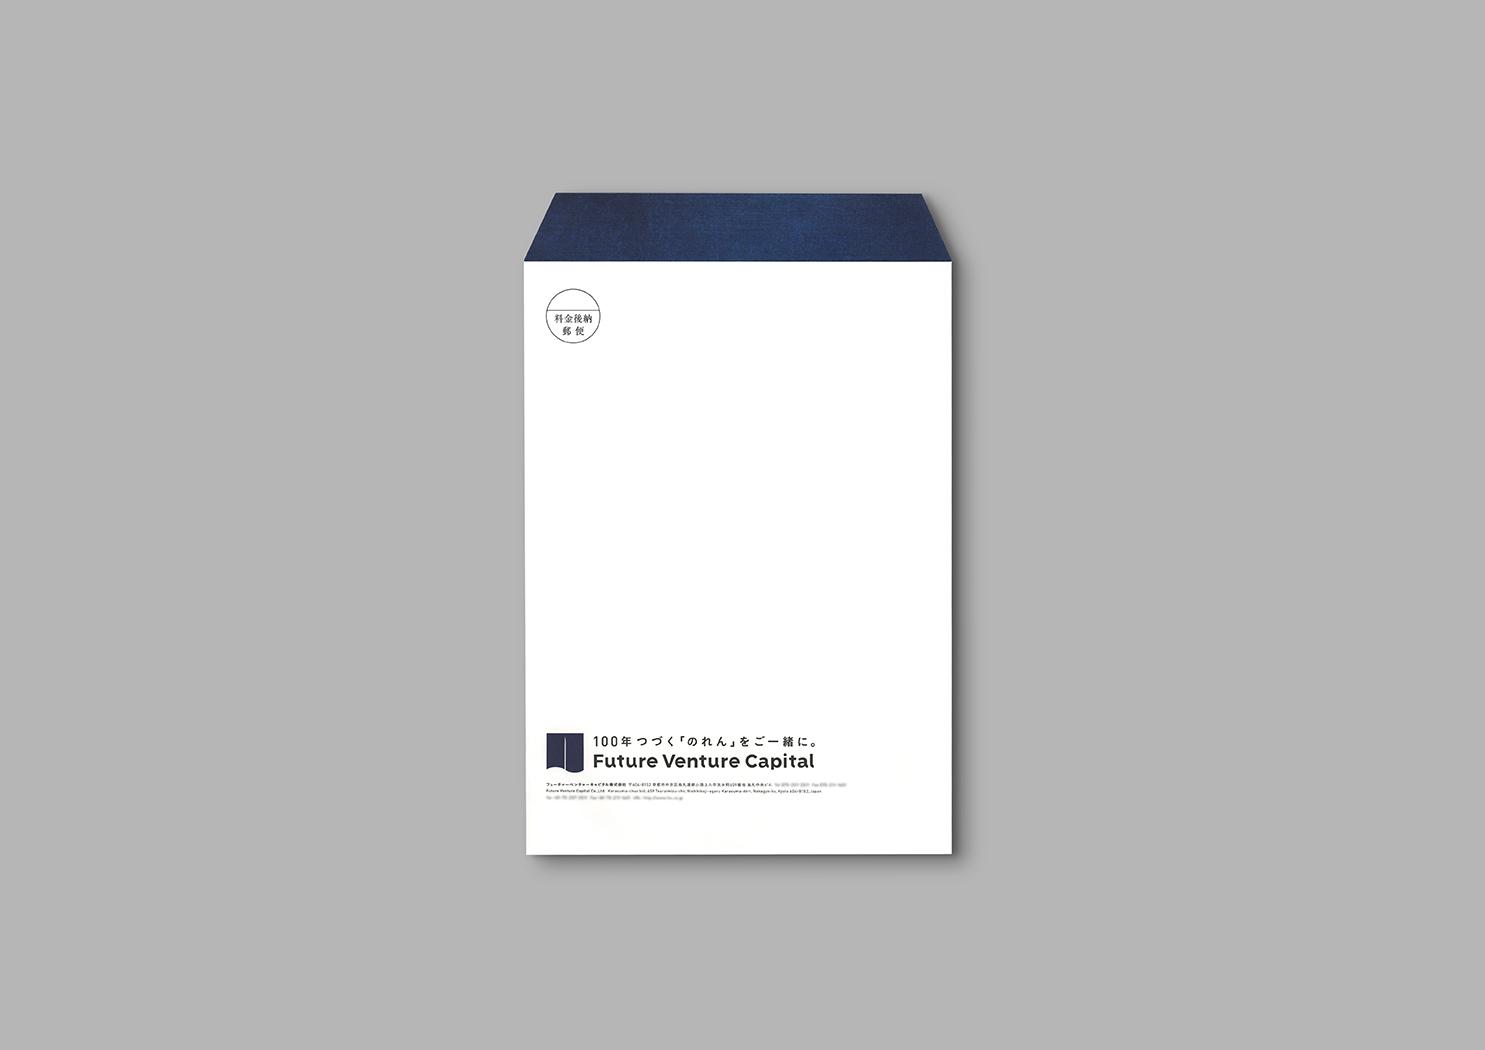 fvc envelope